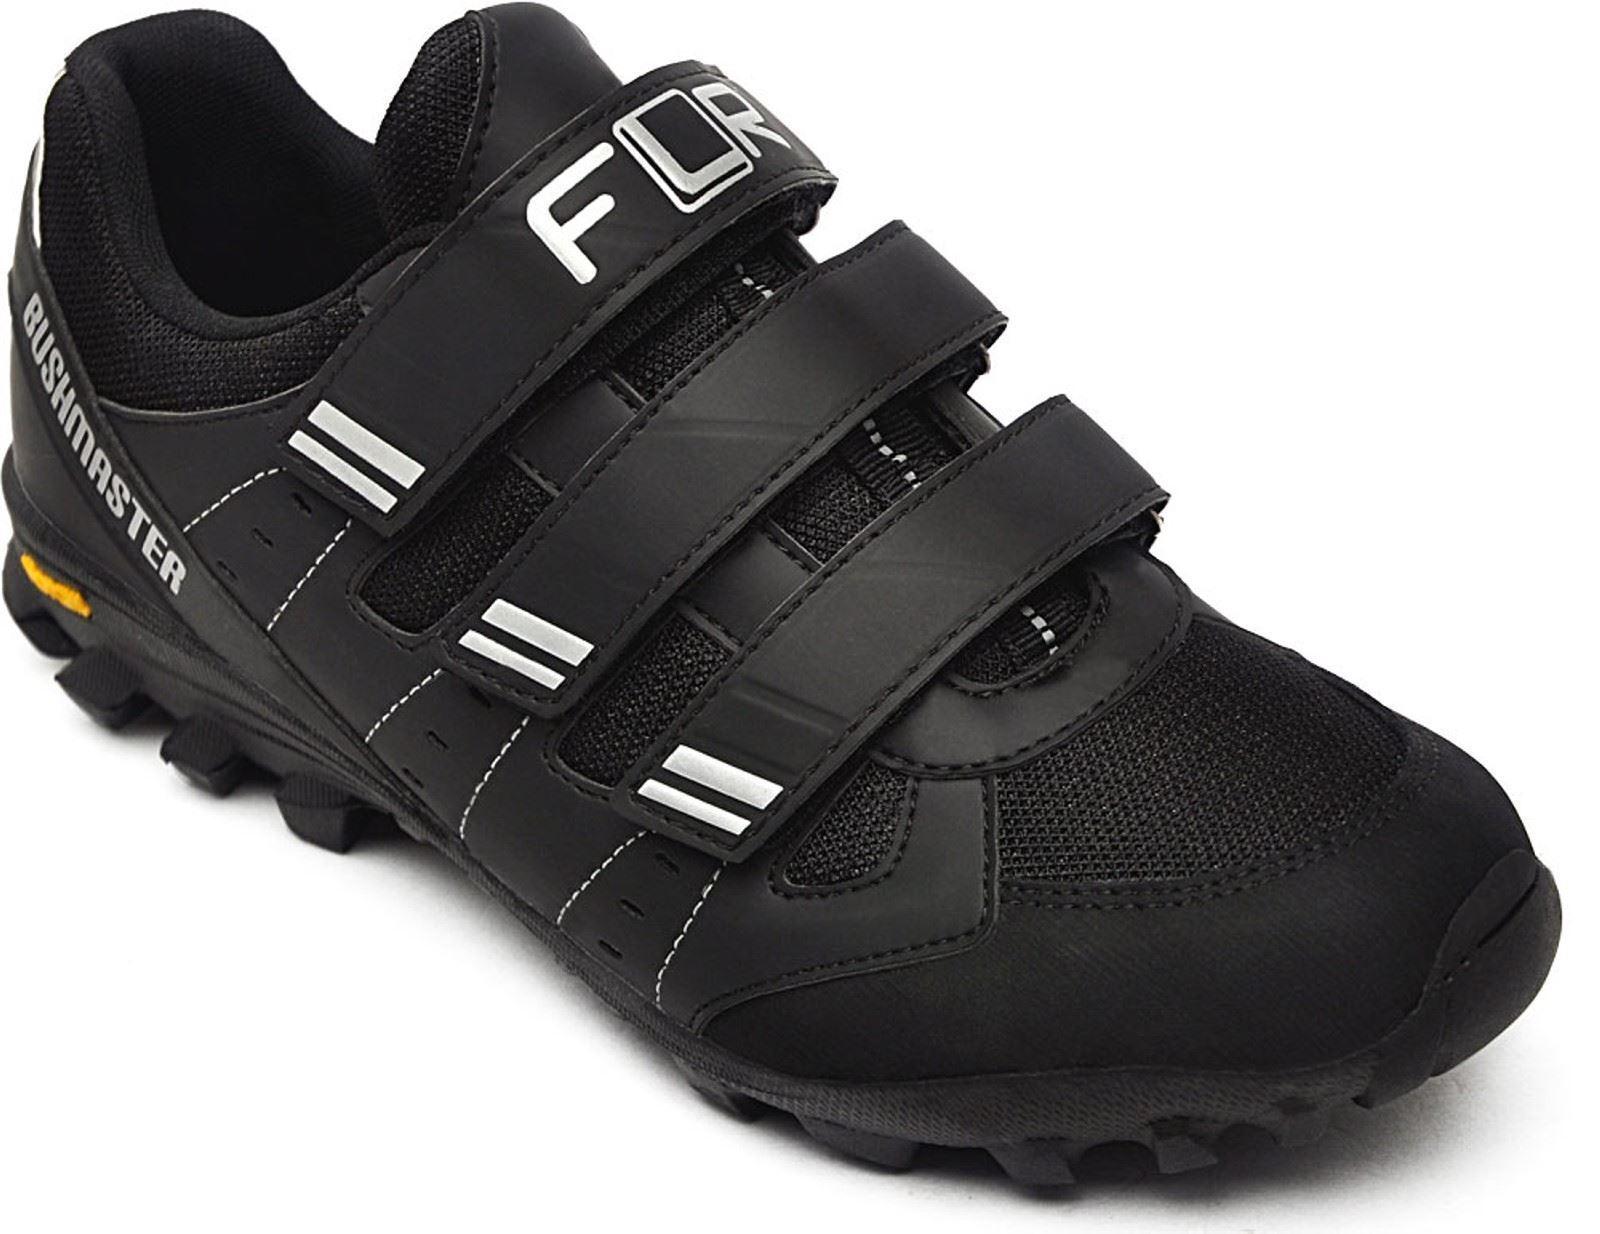 Flr Bushmaster MTB   Trial Zapato Negro Plata con Cierre -